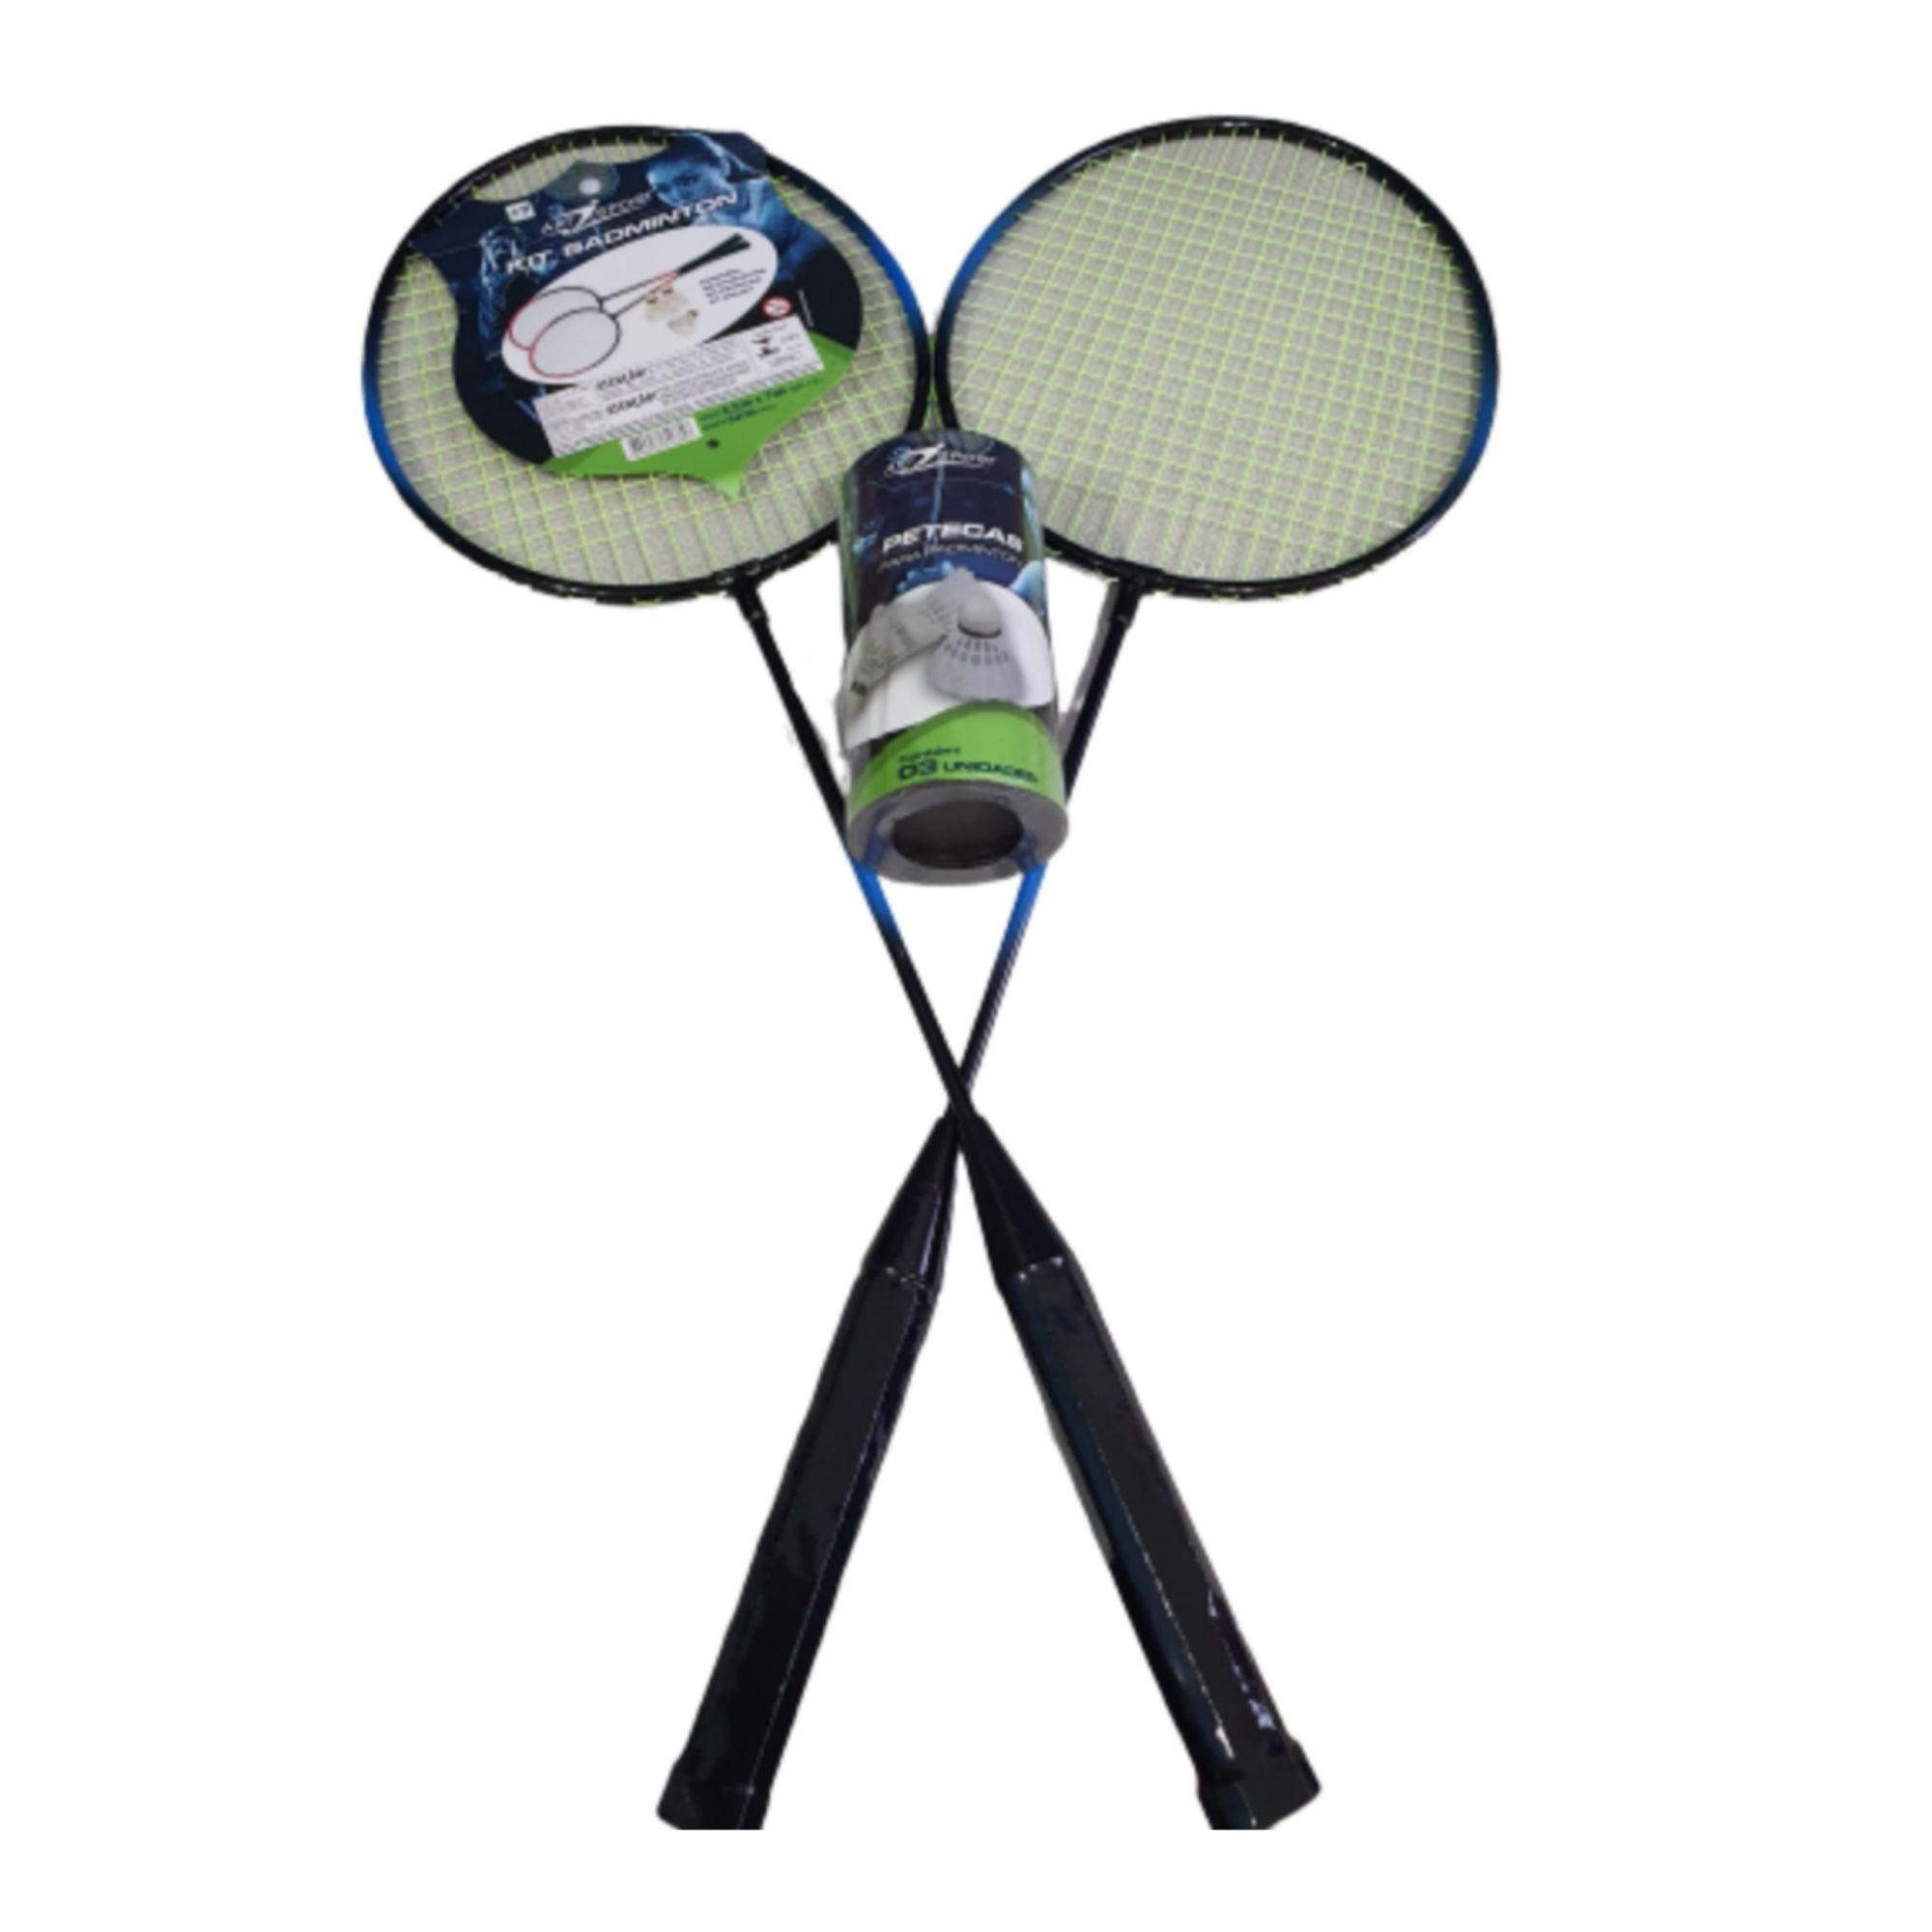 Kit 2 Raquetes Badminton+Petecas+Bolsa